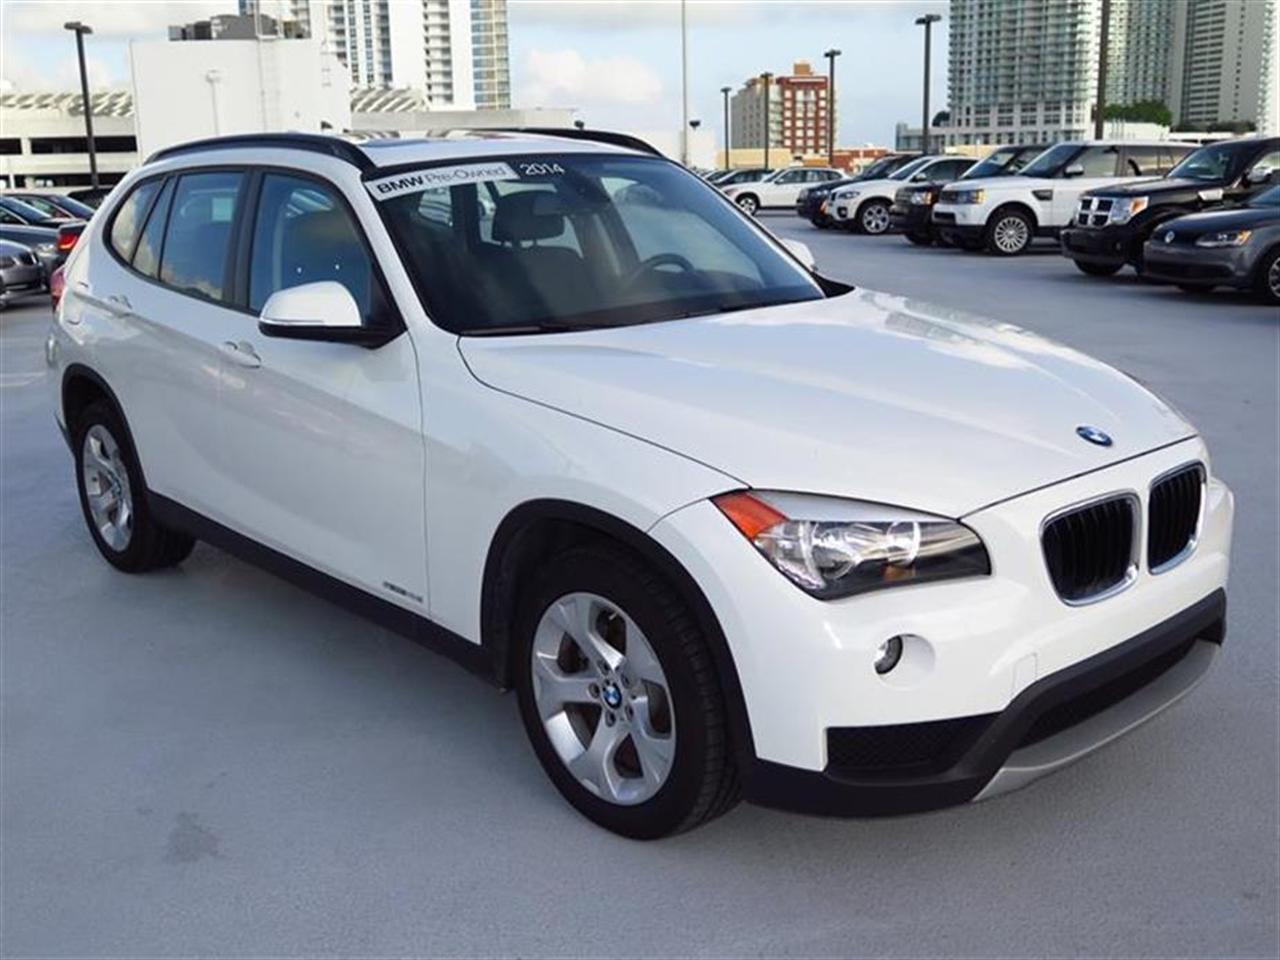 2014 BMW X1 RWD 4dr sDrive28i 6081 miles VIN WBAVM1C58EVW50032